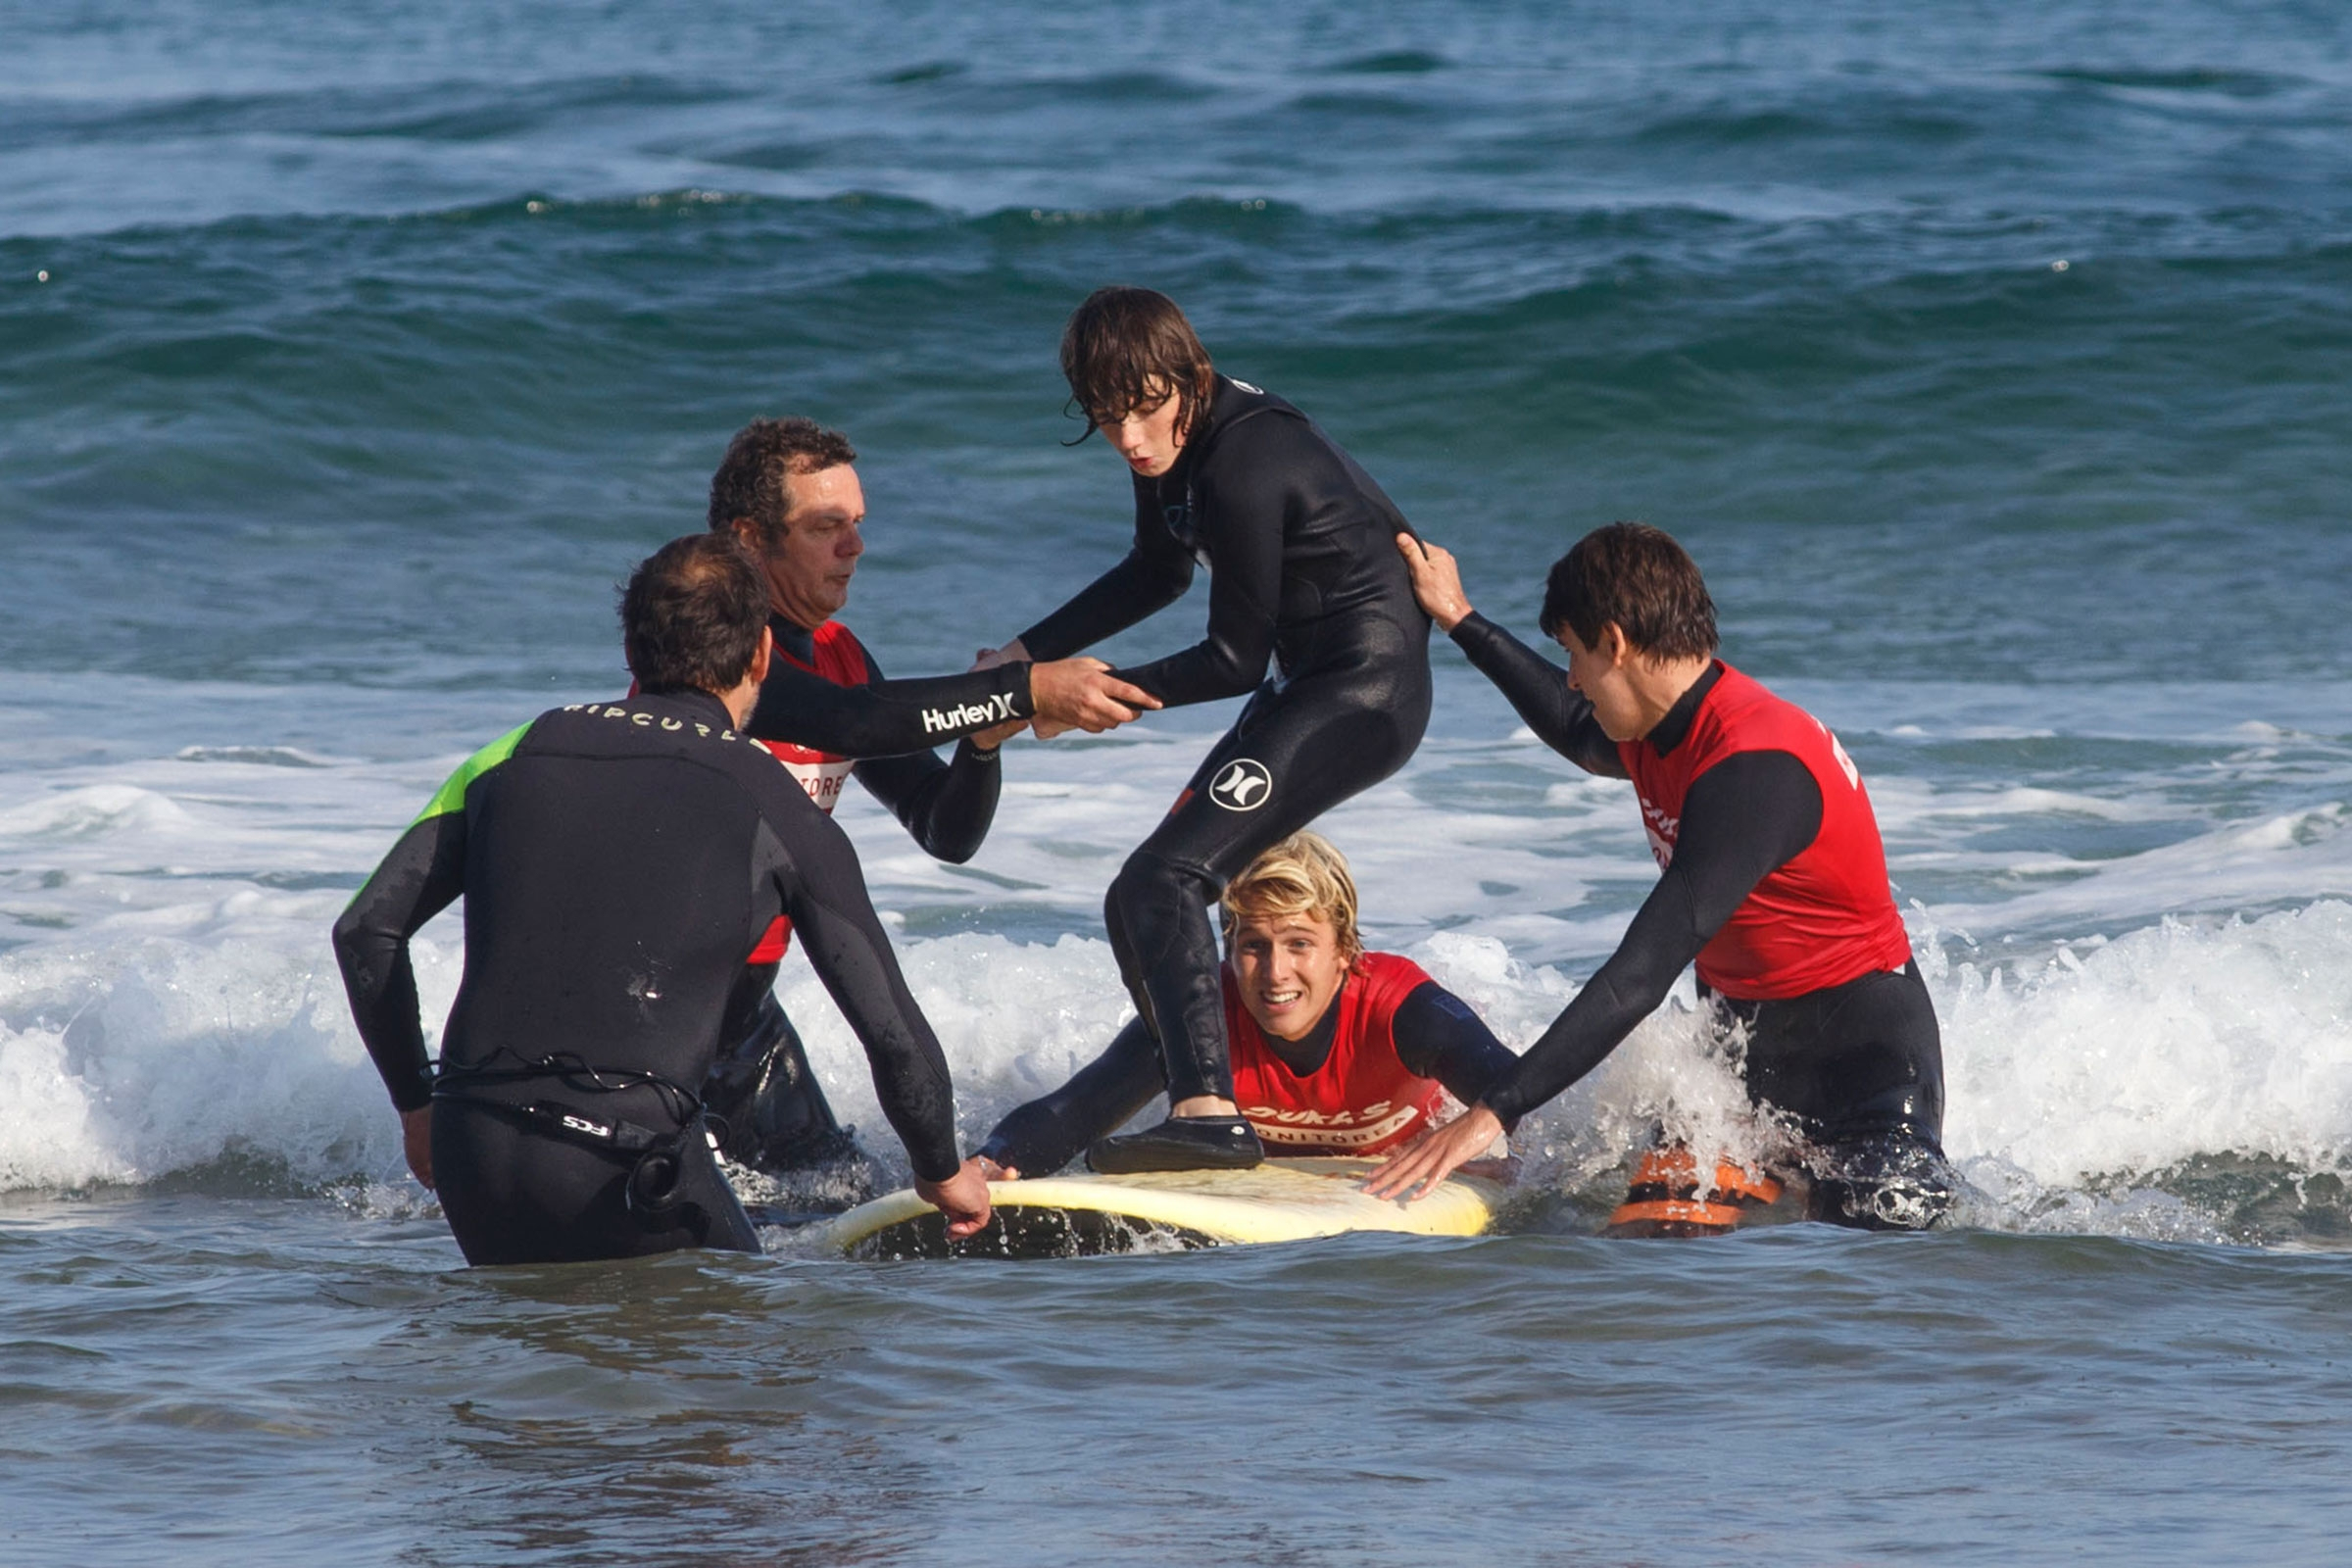 Excepcional fin de semana de Surfing Adaptado en aguas de Zarautz